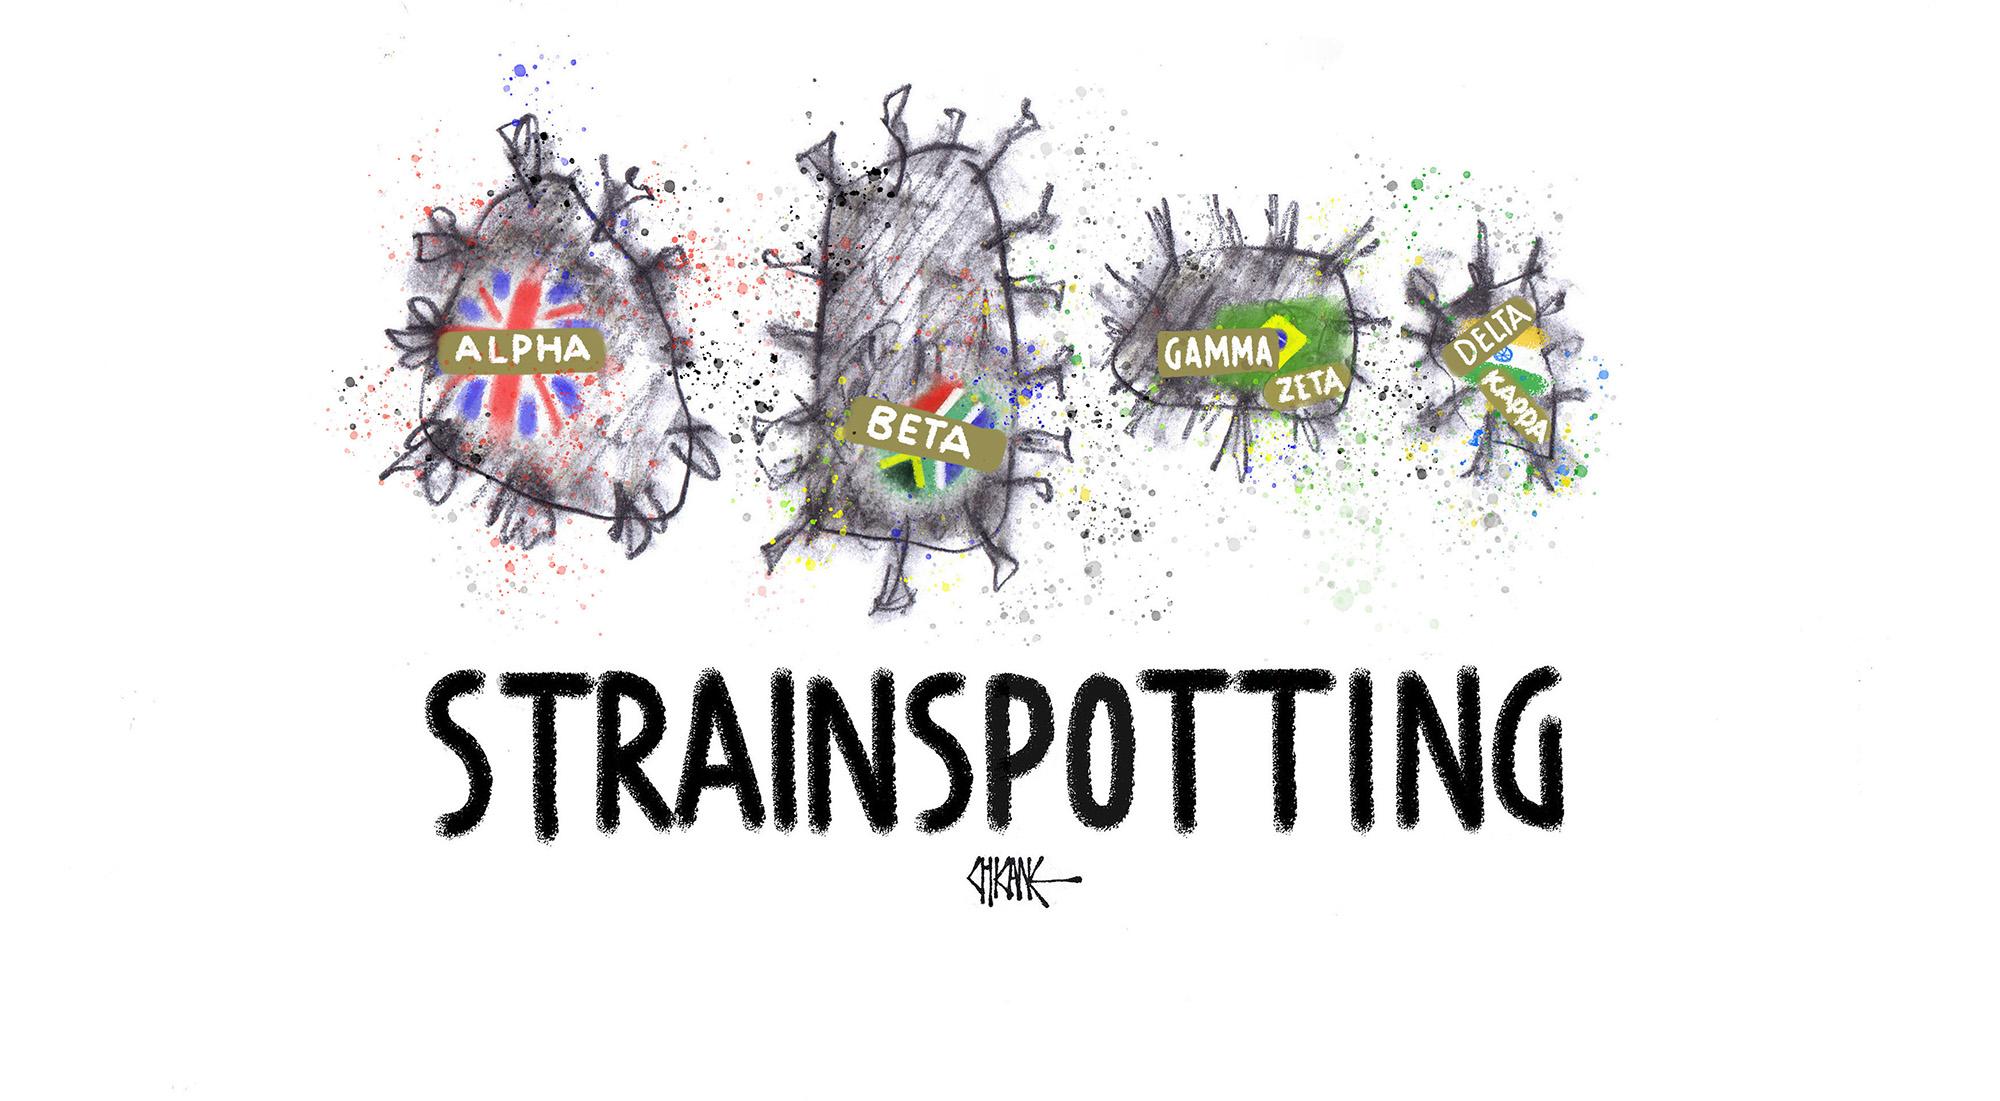 Strainspotting the Greek alphabet variants cartoon by Chicane